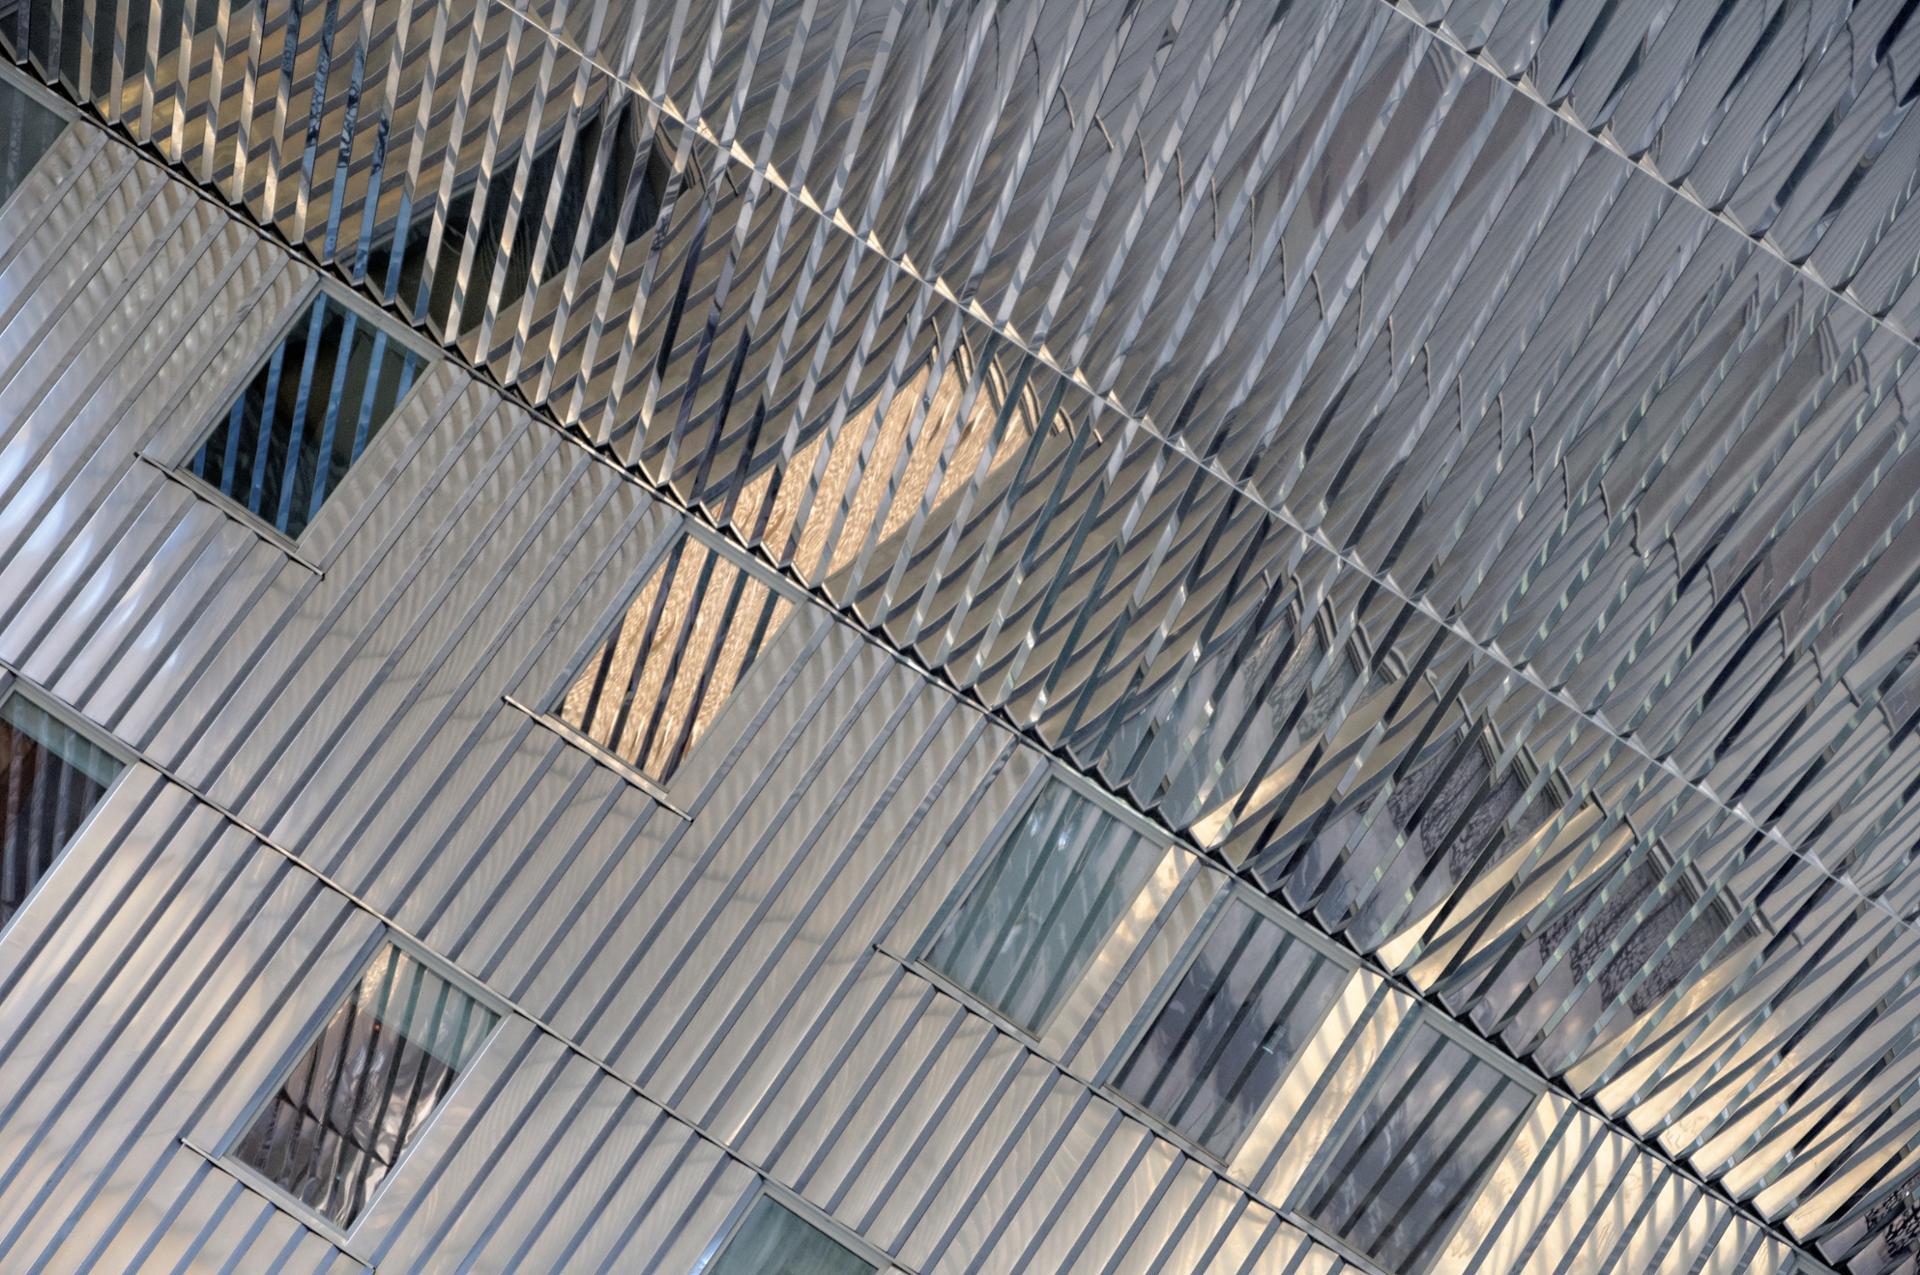 Reflets urbains tranchants